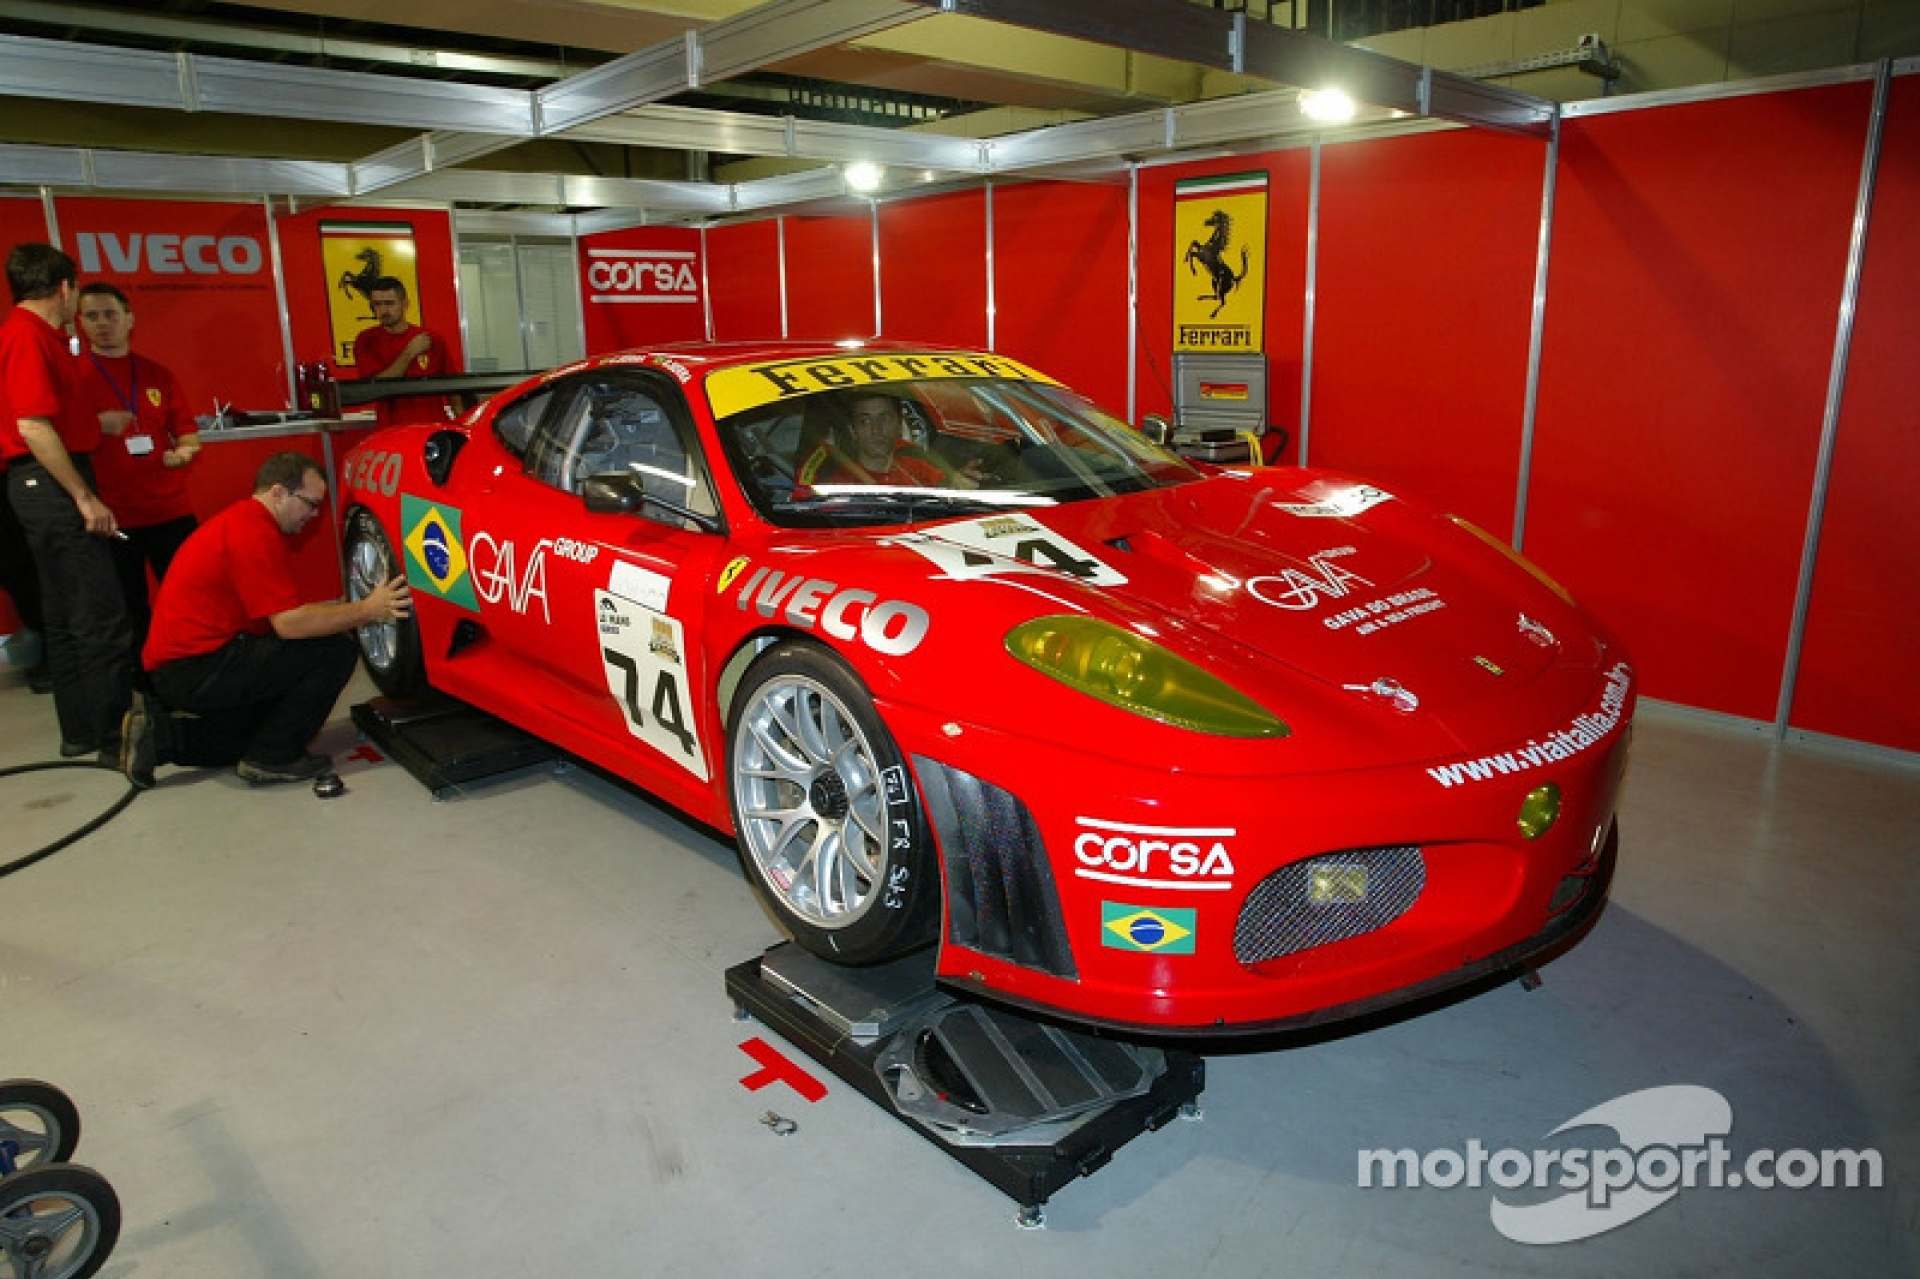 elms-interlagos-2007-jmb-racing-ferrari-f430-gt.jpg